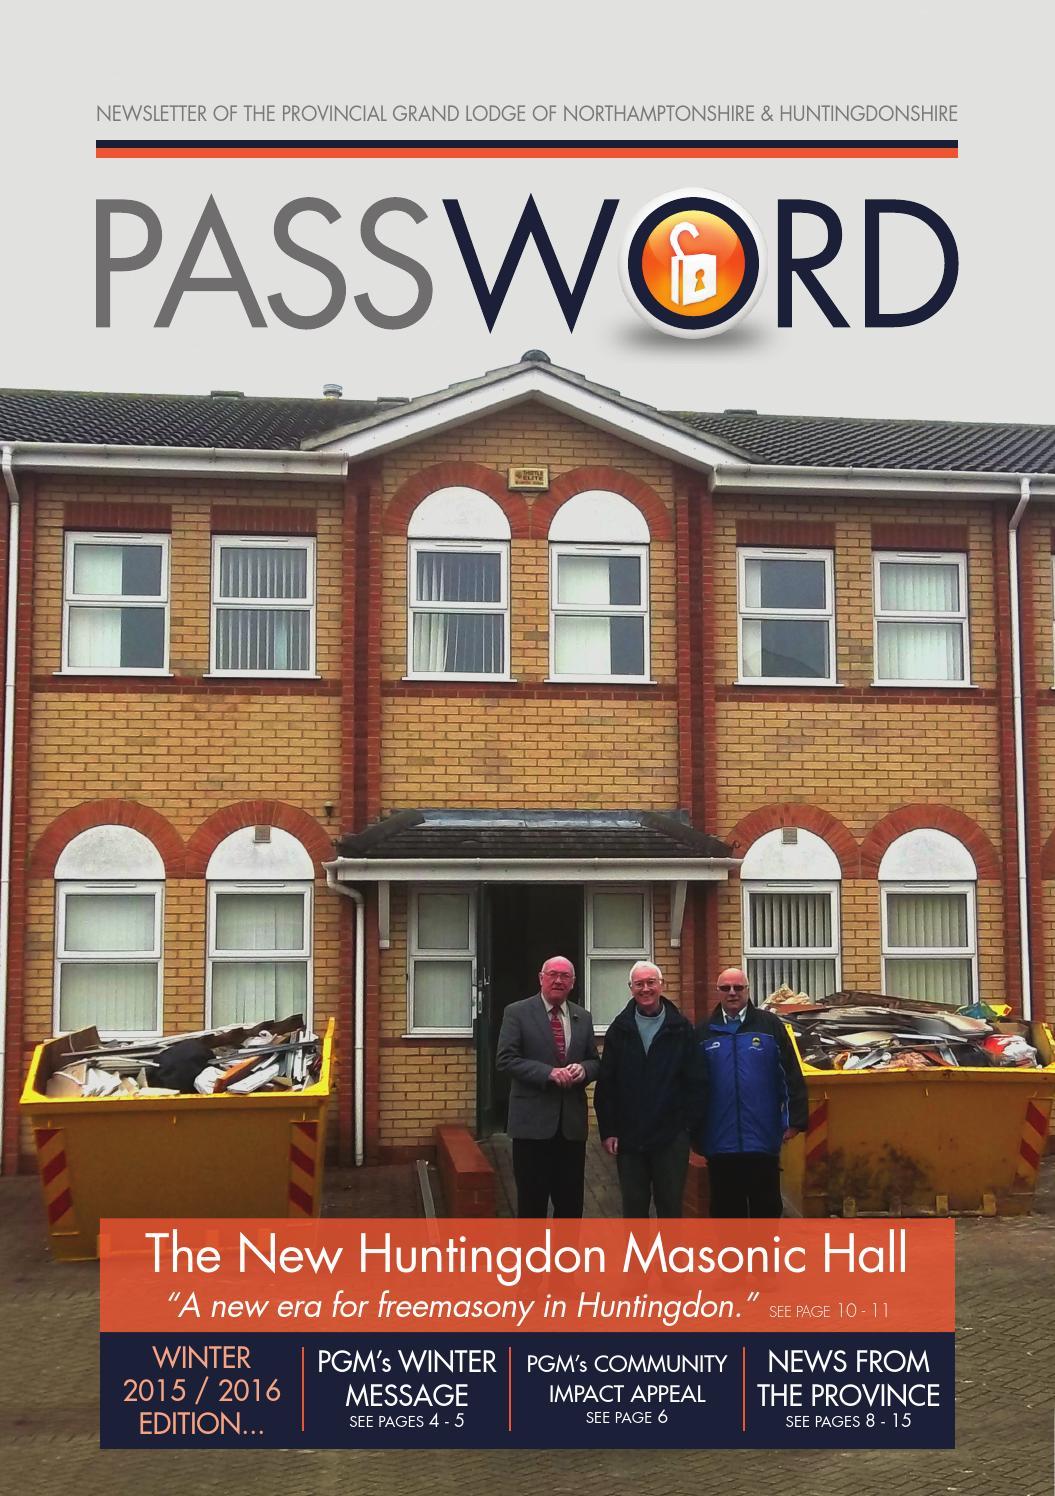 Password Winter 2015/16 by Northants and Hunts Masons - issuu